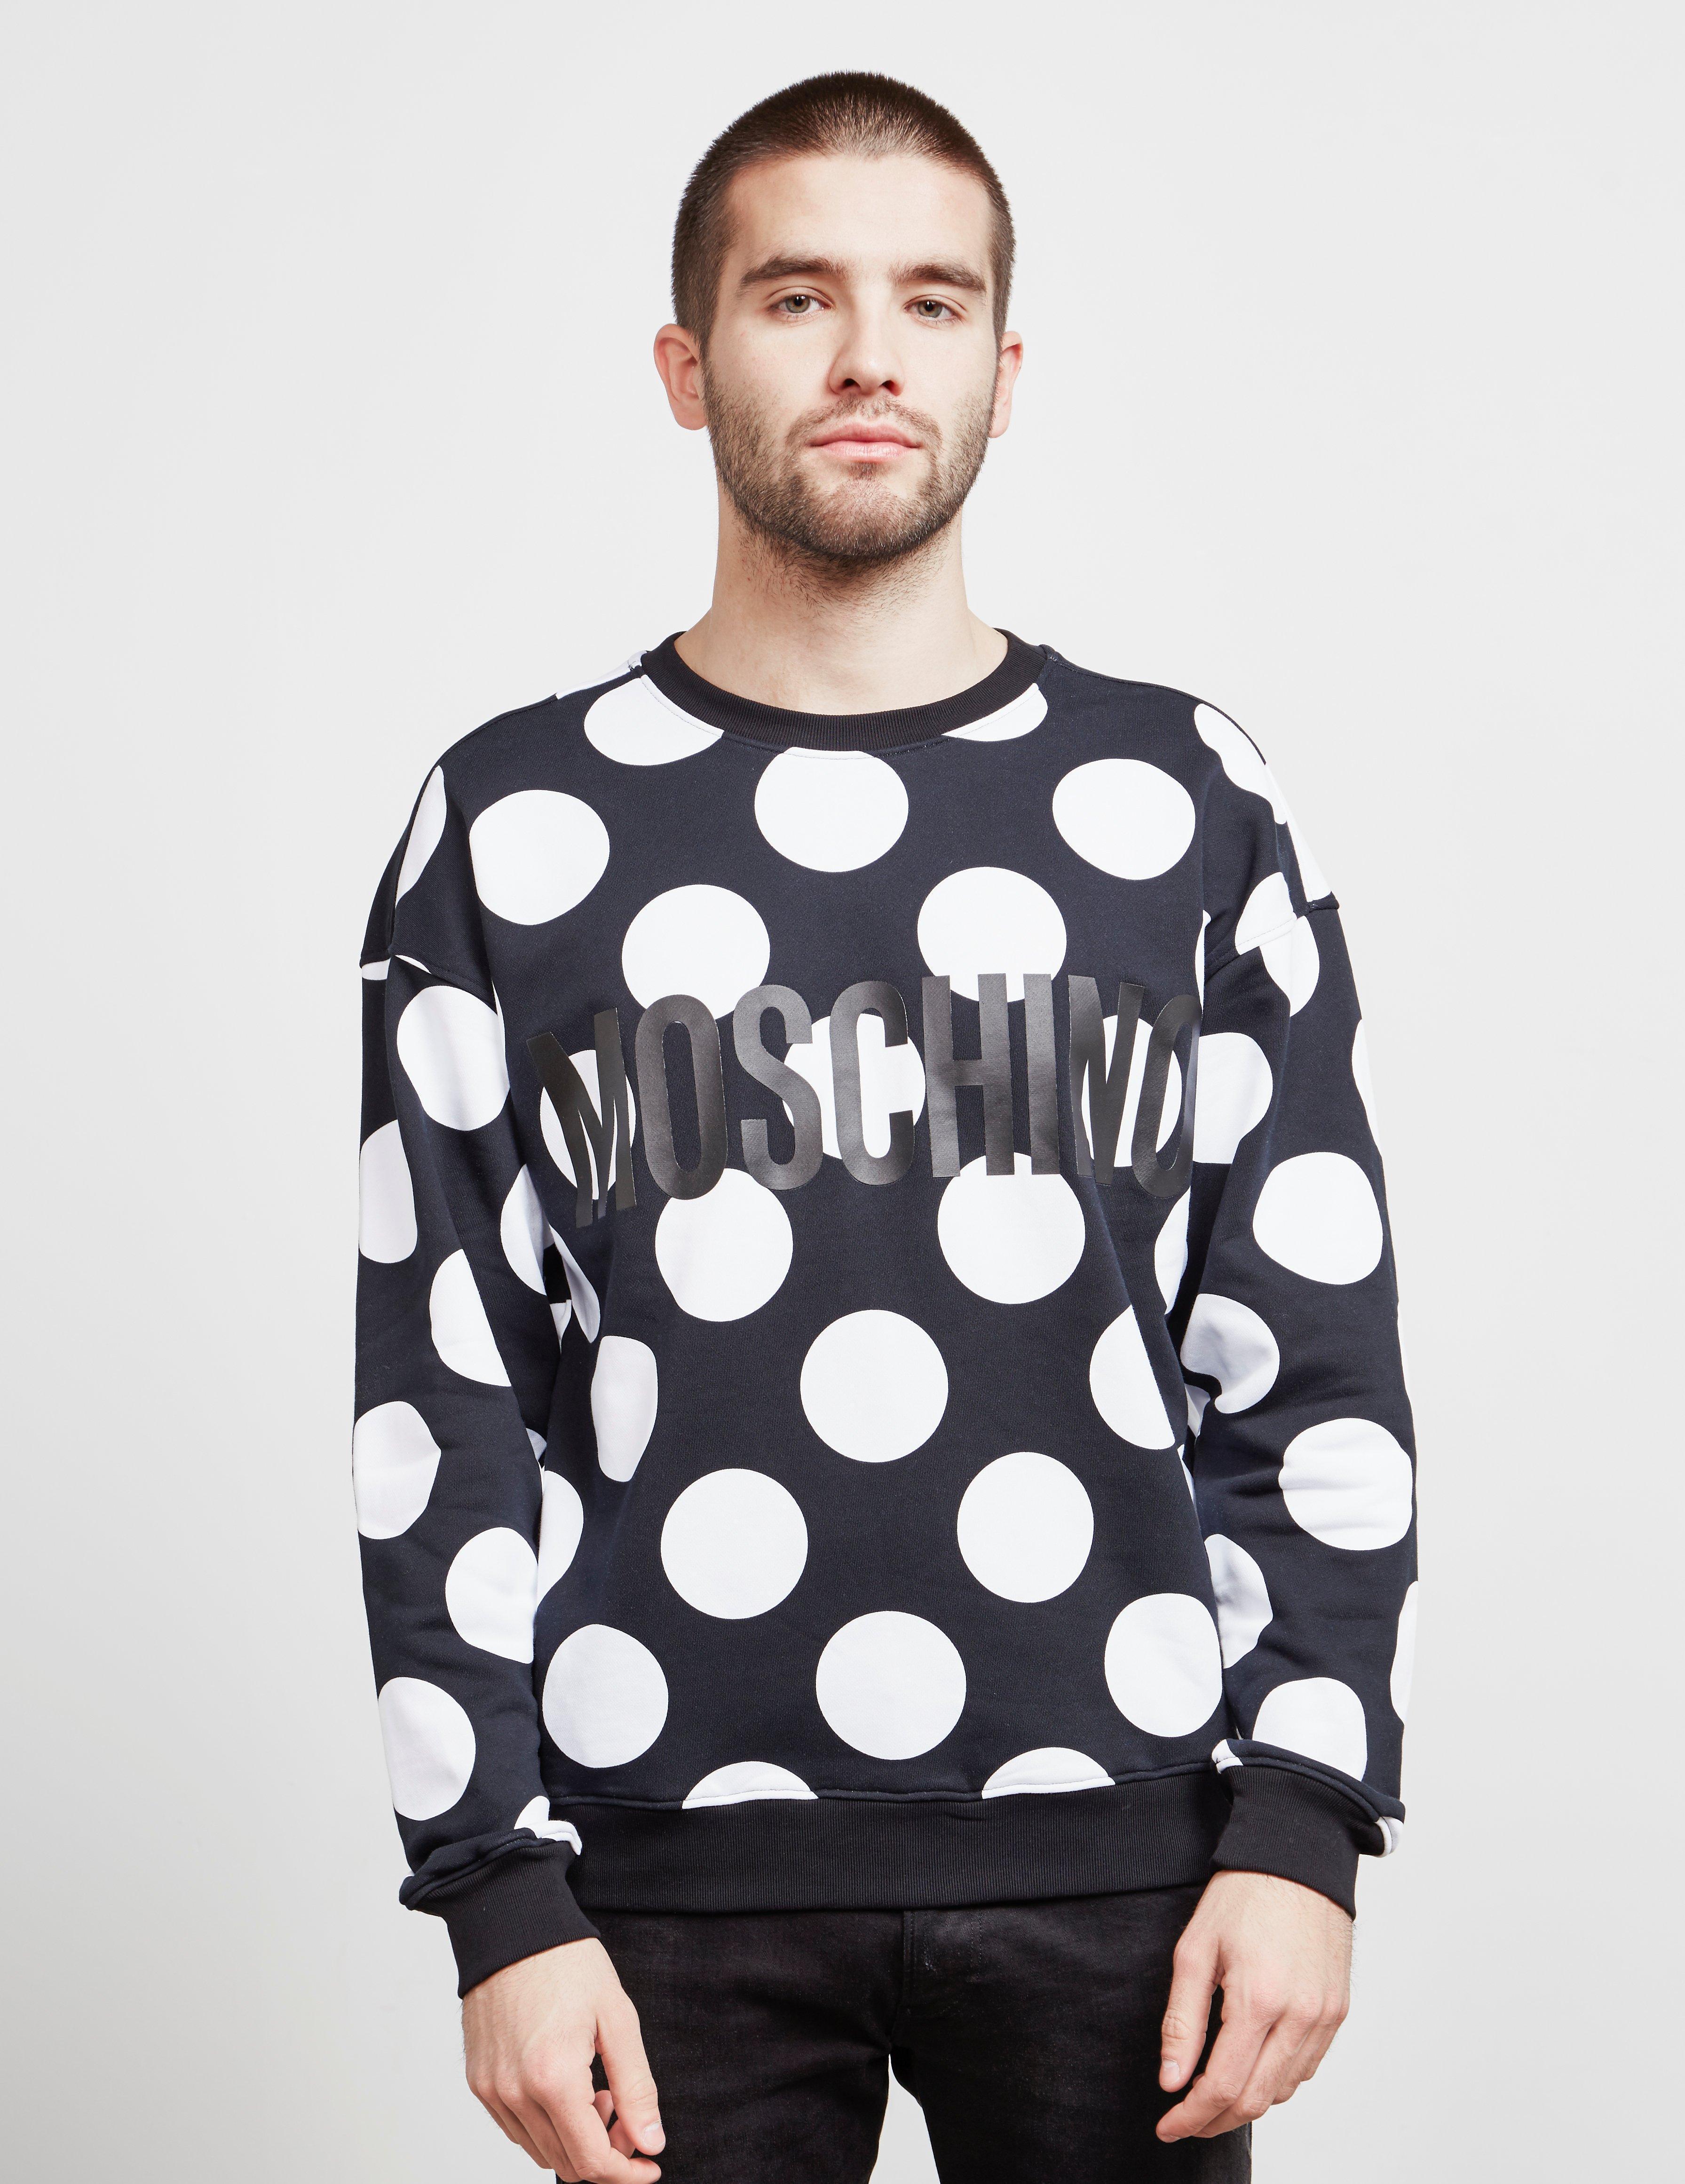 0b561875c Lyst - Moschino Polka Dot Sweatshirt Black in Black for Men - Save 21%